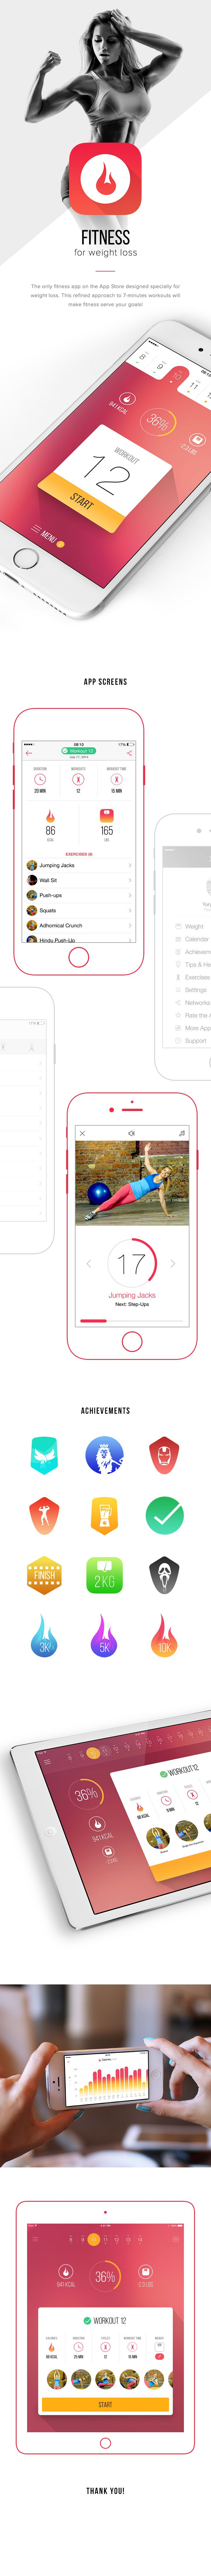 #fitness #app